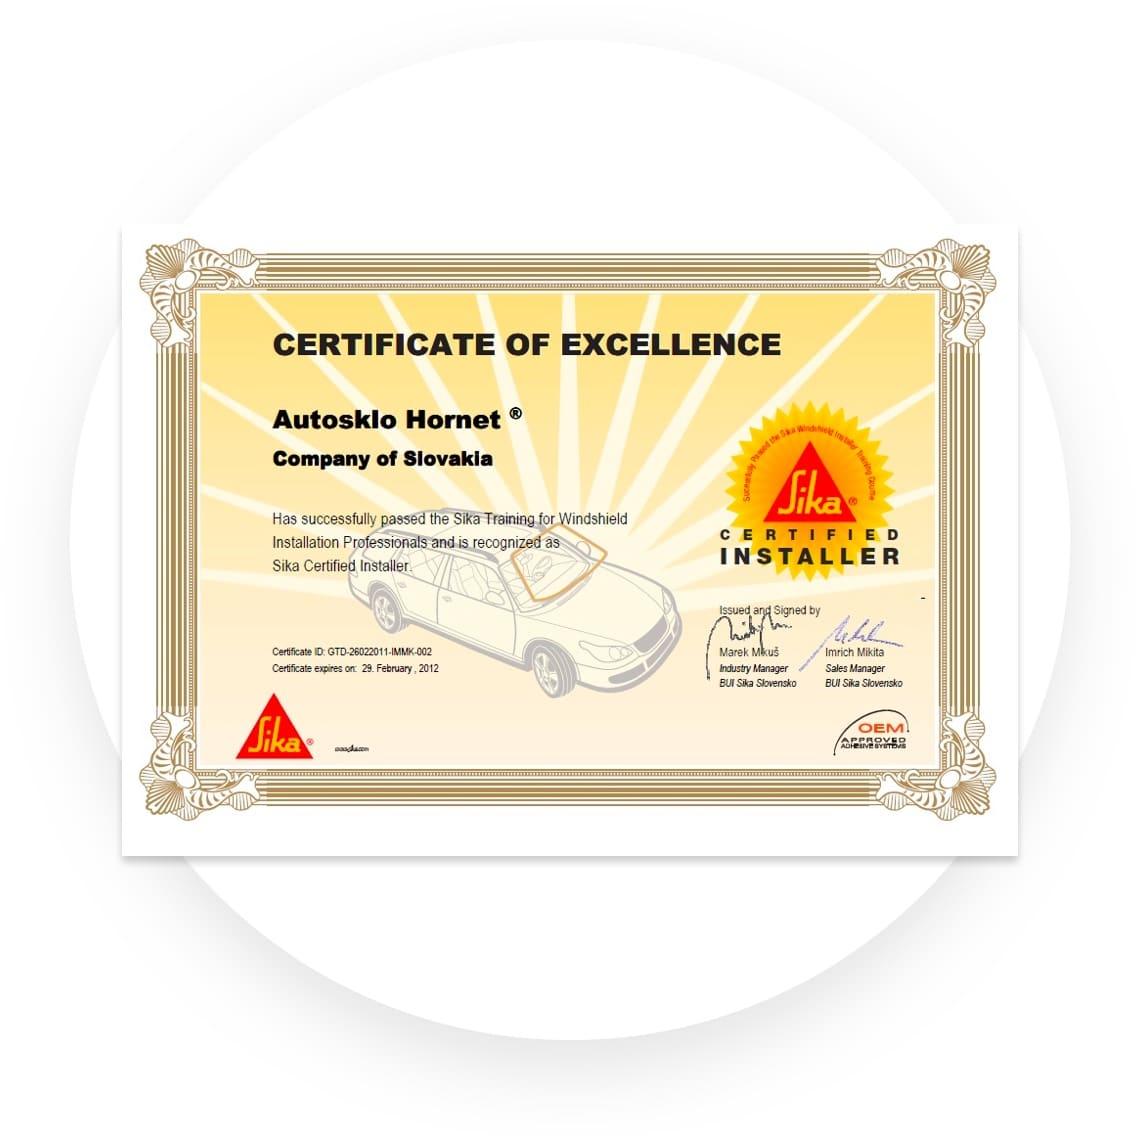 image onaas certifikat